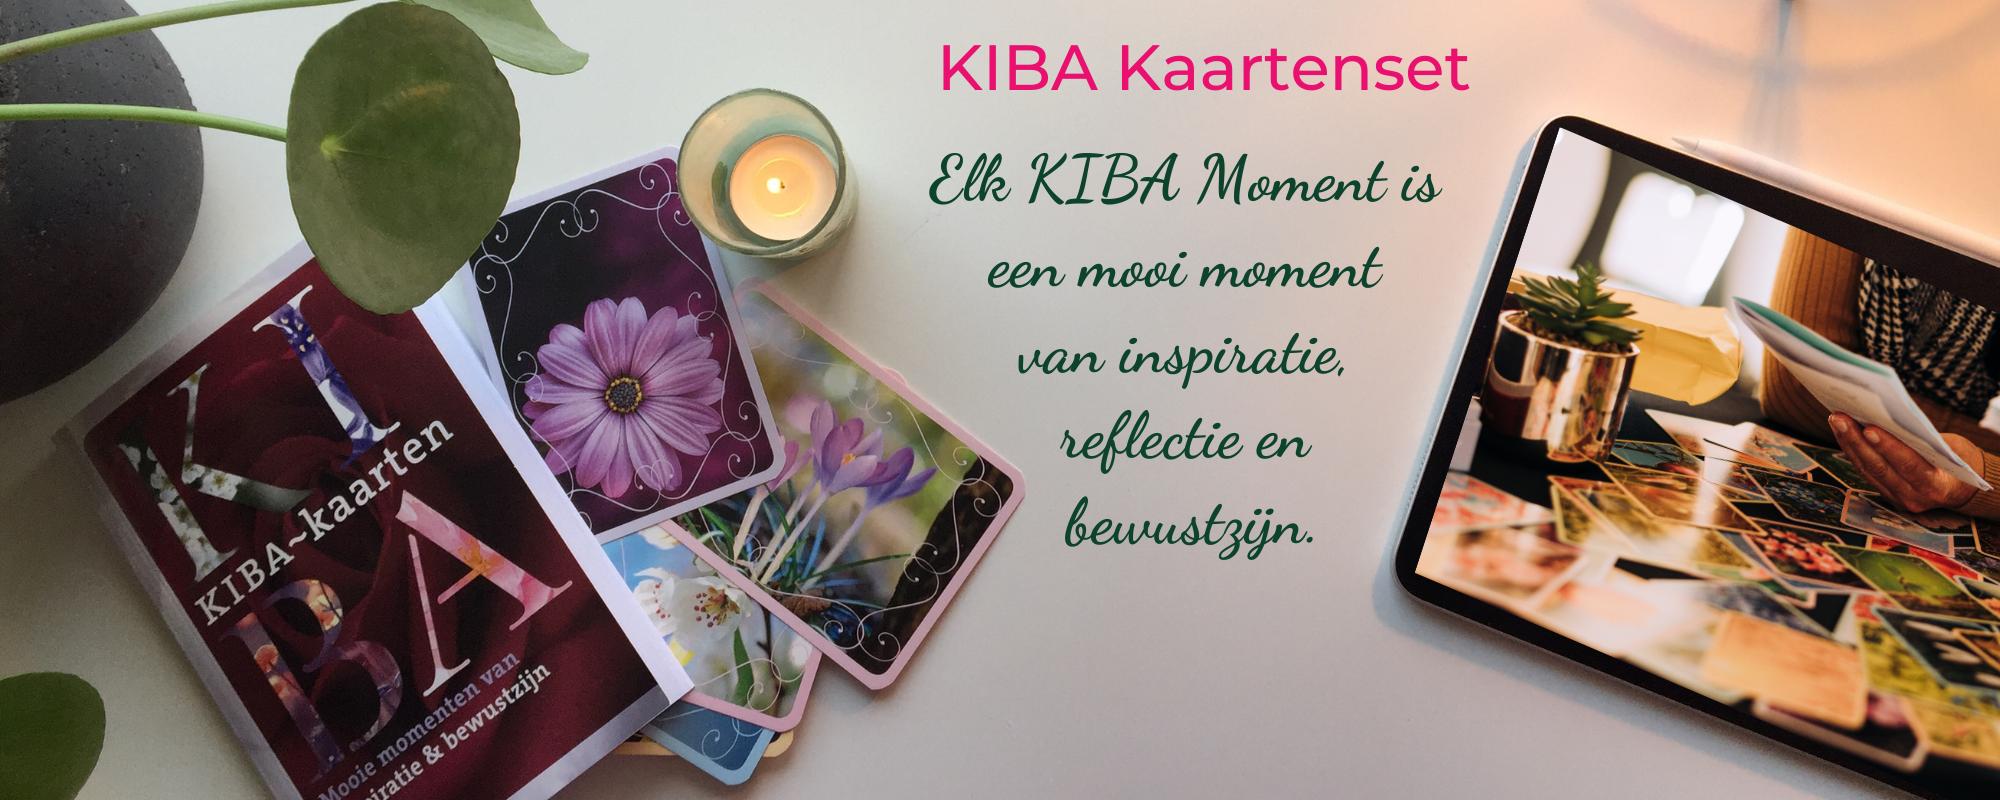 KIBA Kaartenset van Sabine Hess